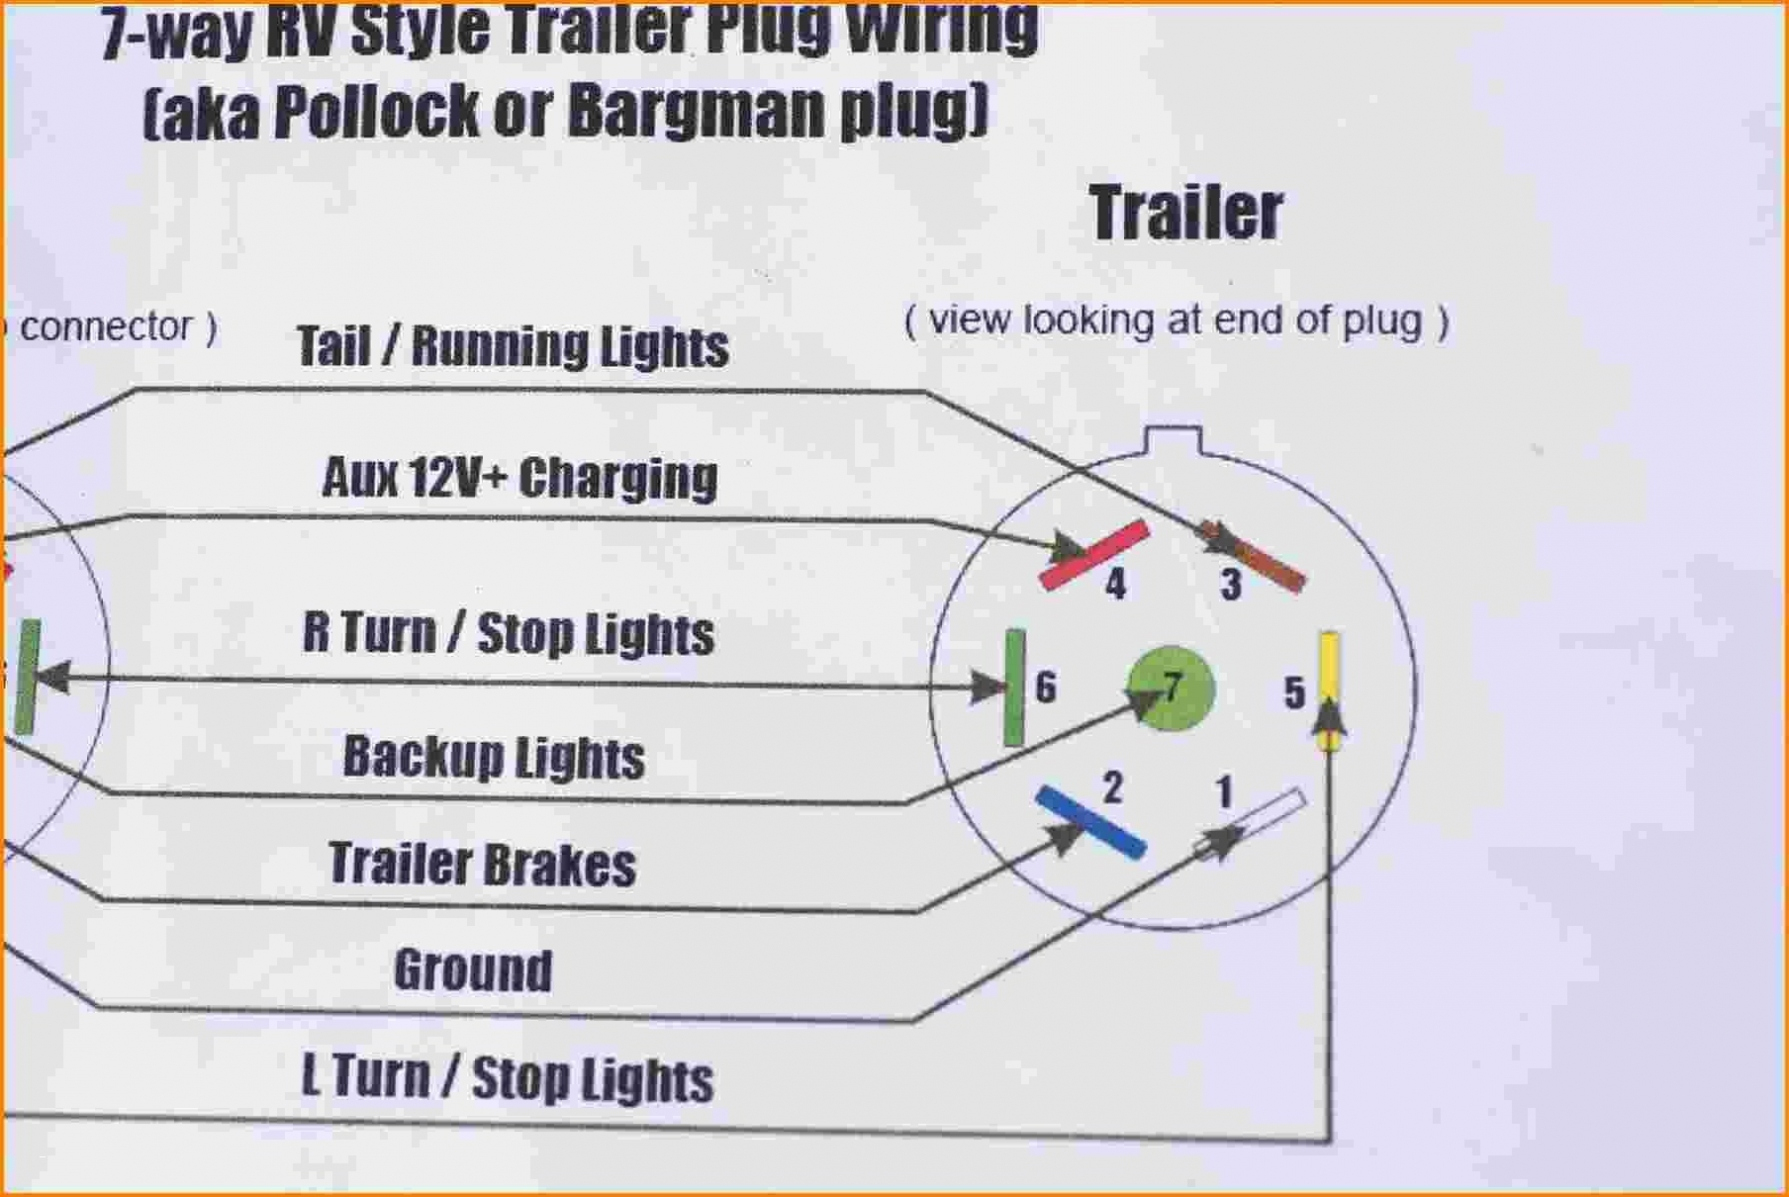 6 Round Trailer Plug Wiring Diagram | Manual E-Books - 7 Pin Round Trailer Plug Wiring Diagram